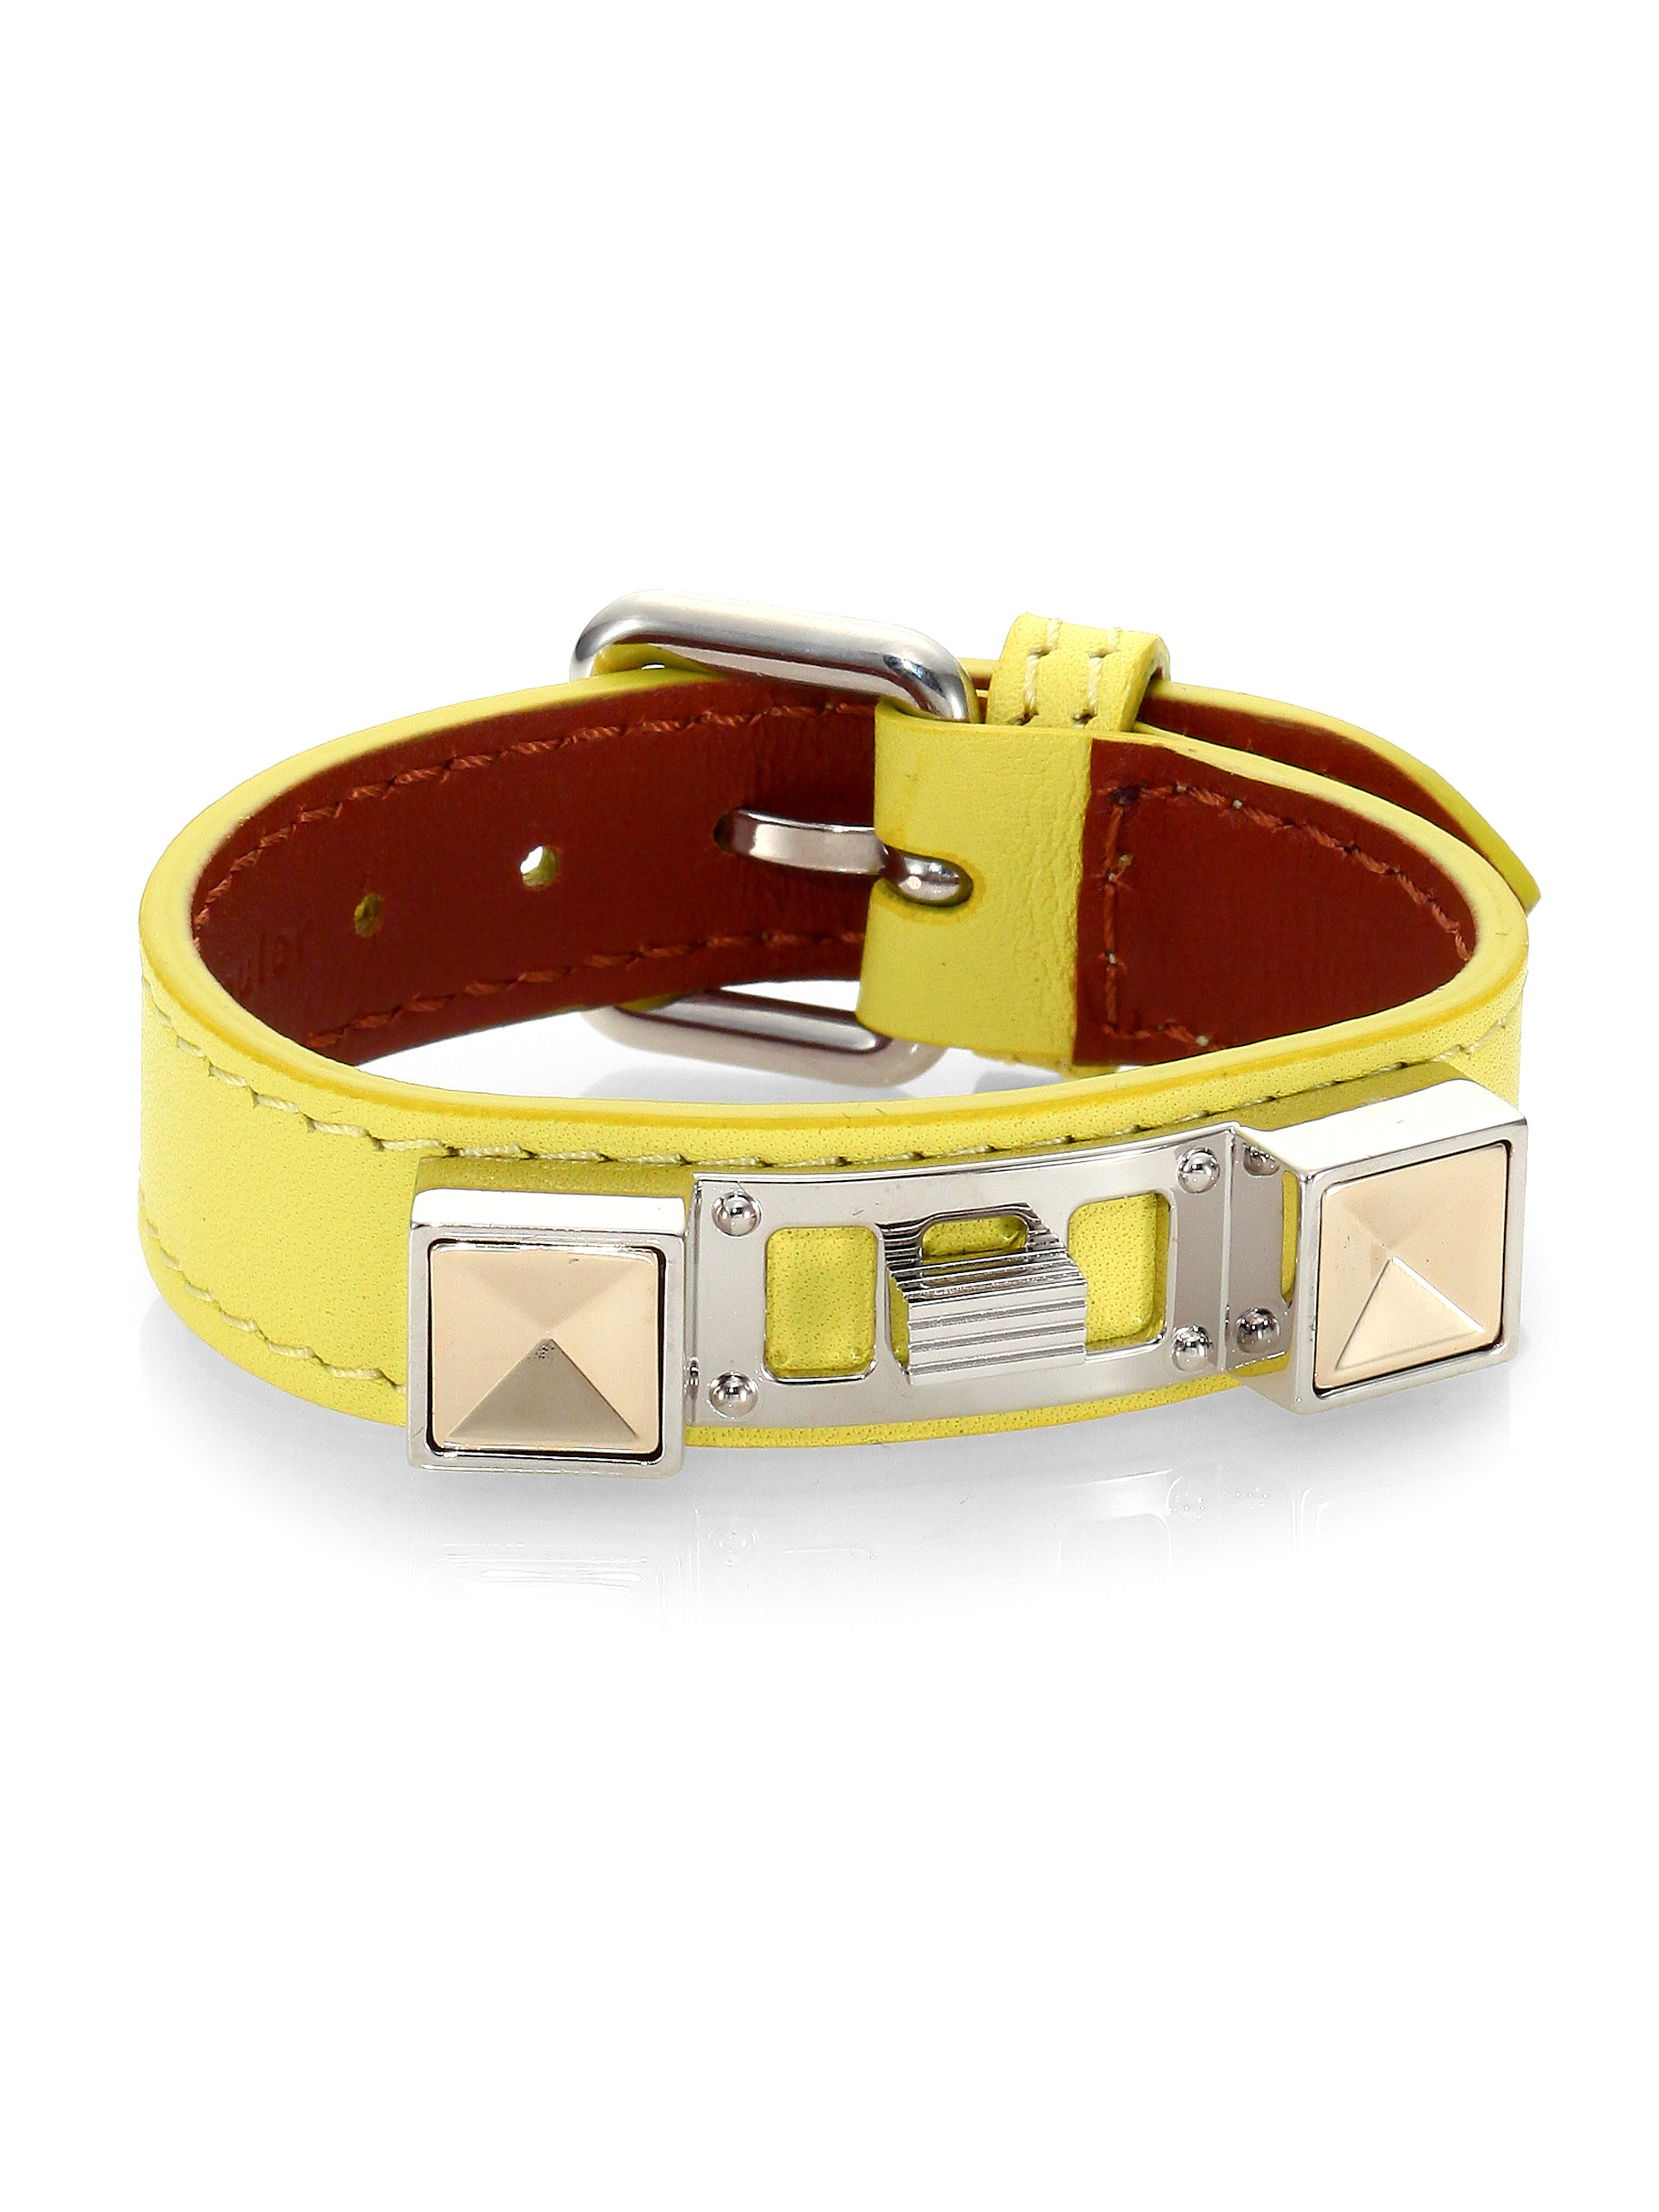 Proenza Schouler Ps11 Small Leather Bracelet in Yellow (LEMON)